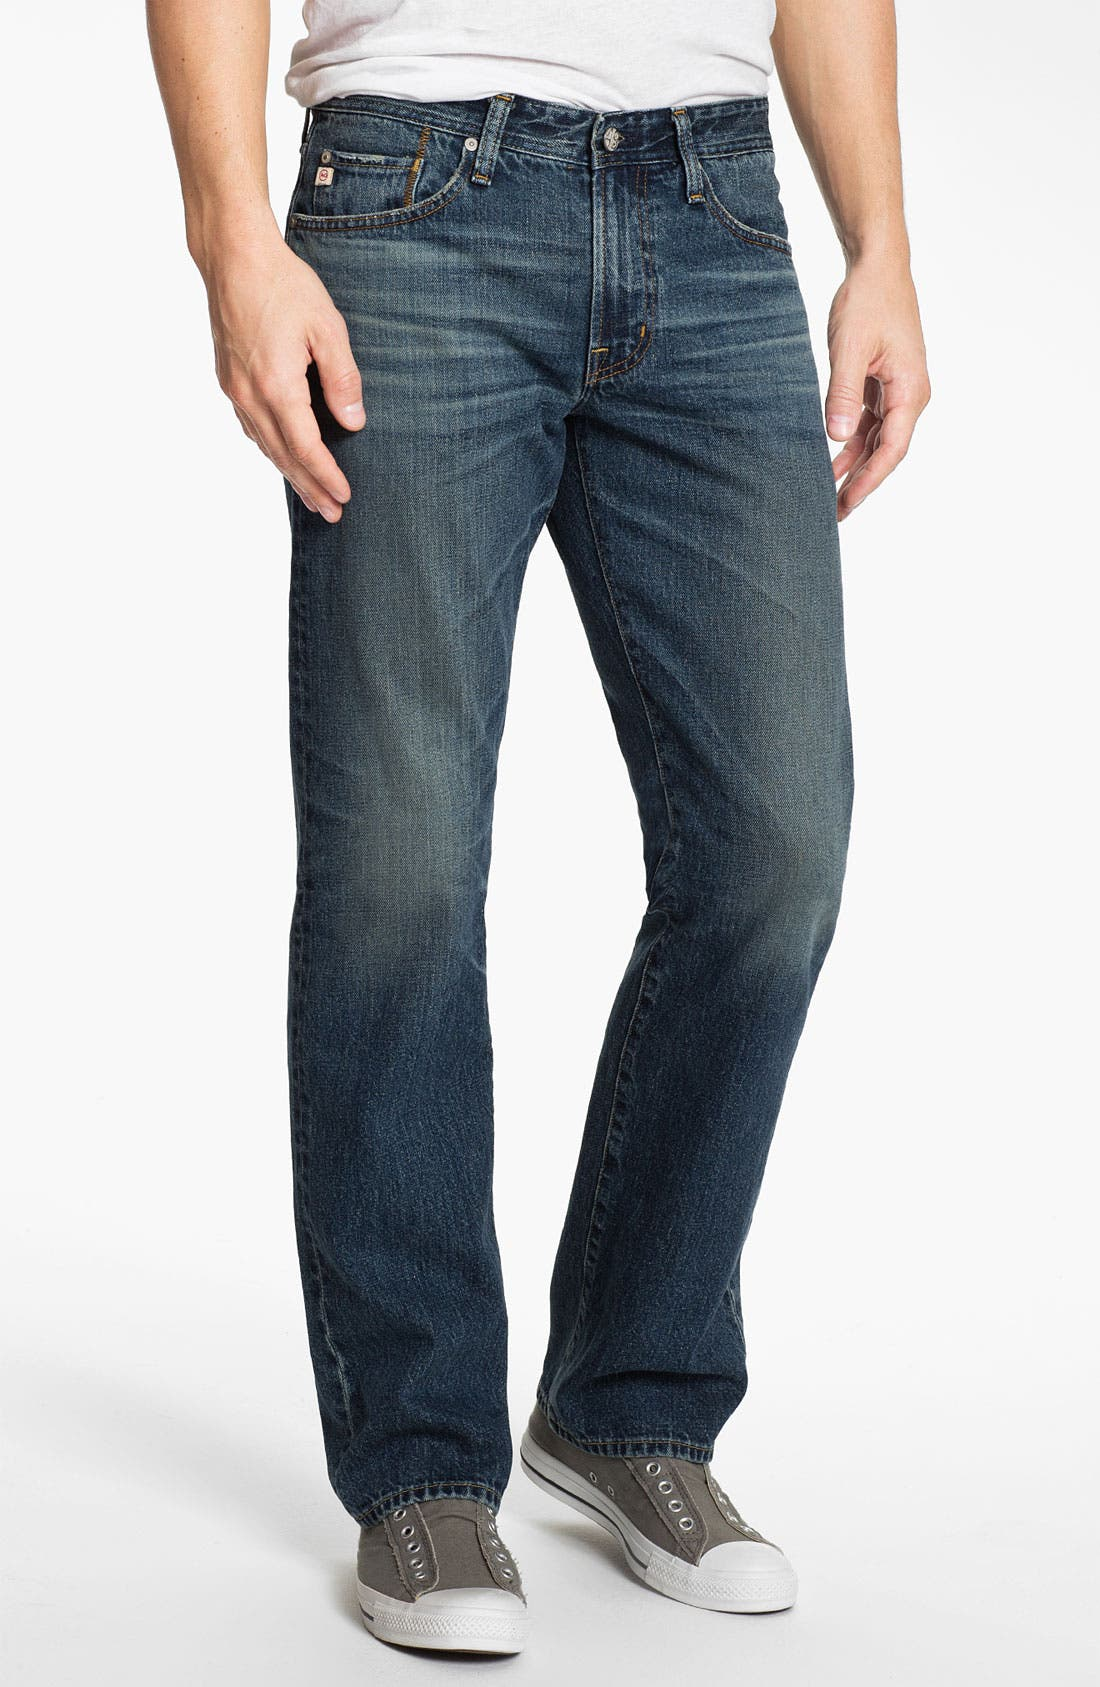 Alternate Image 1 Selected - AG Jeans 'Protégé' Straight Leg Jeans (12-Years Original)